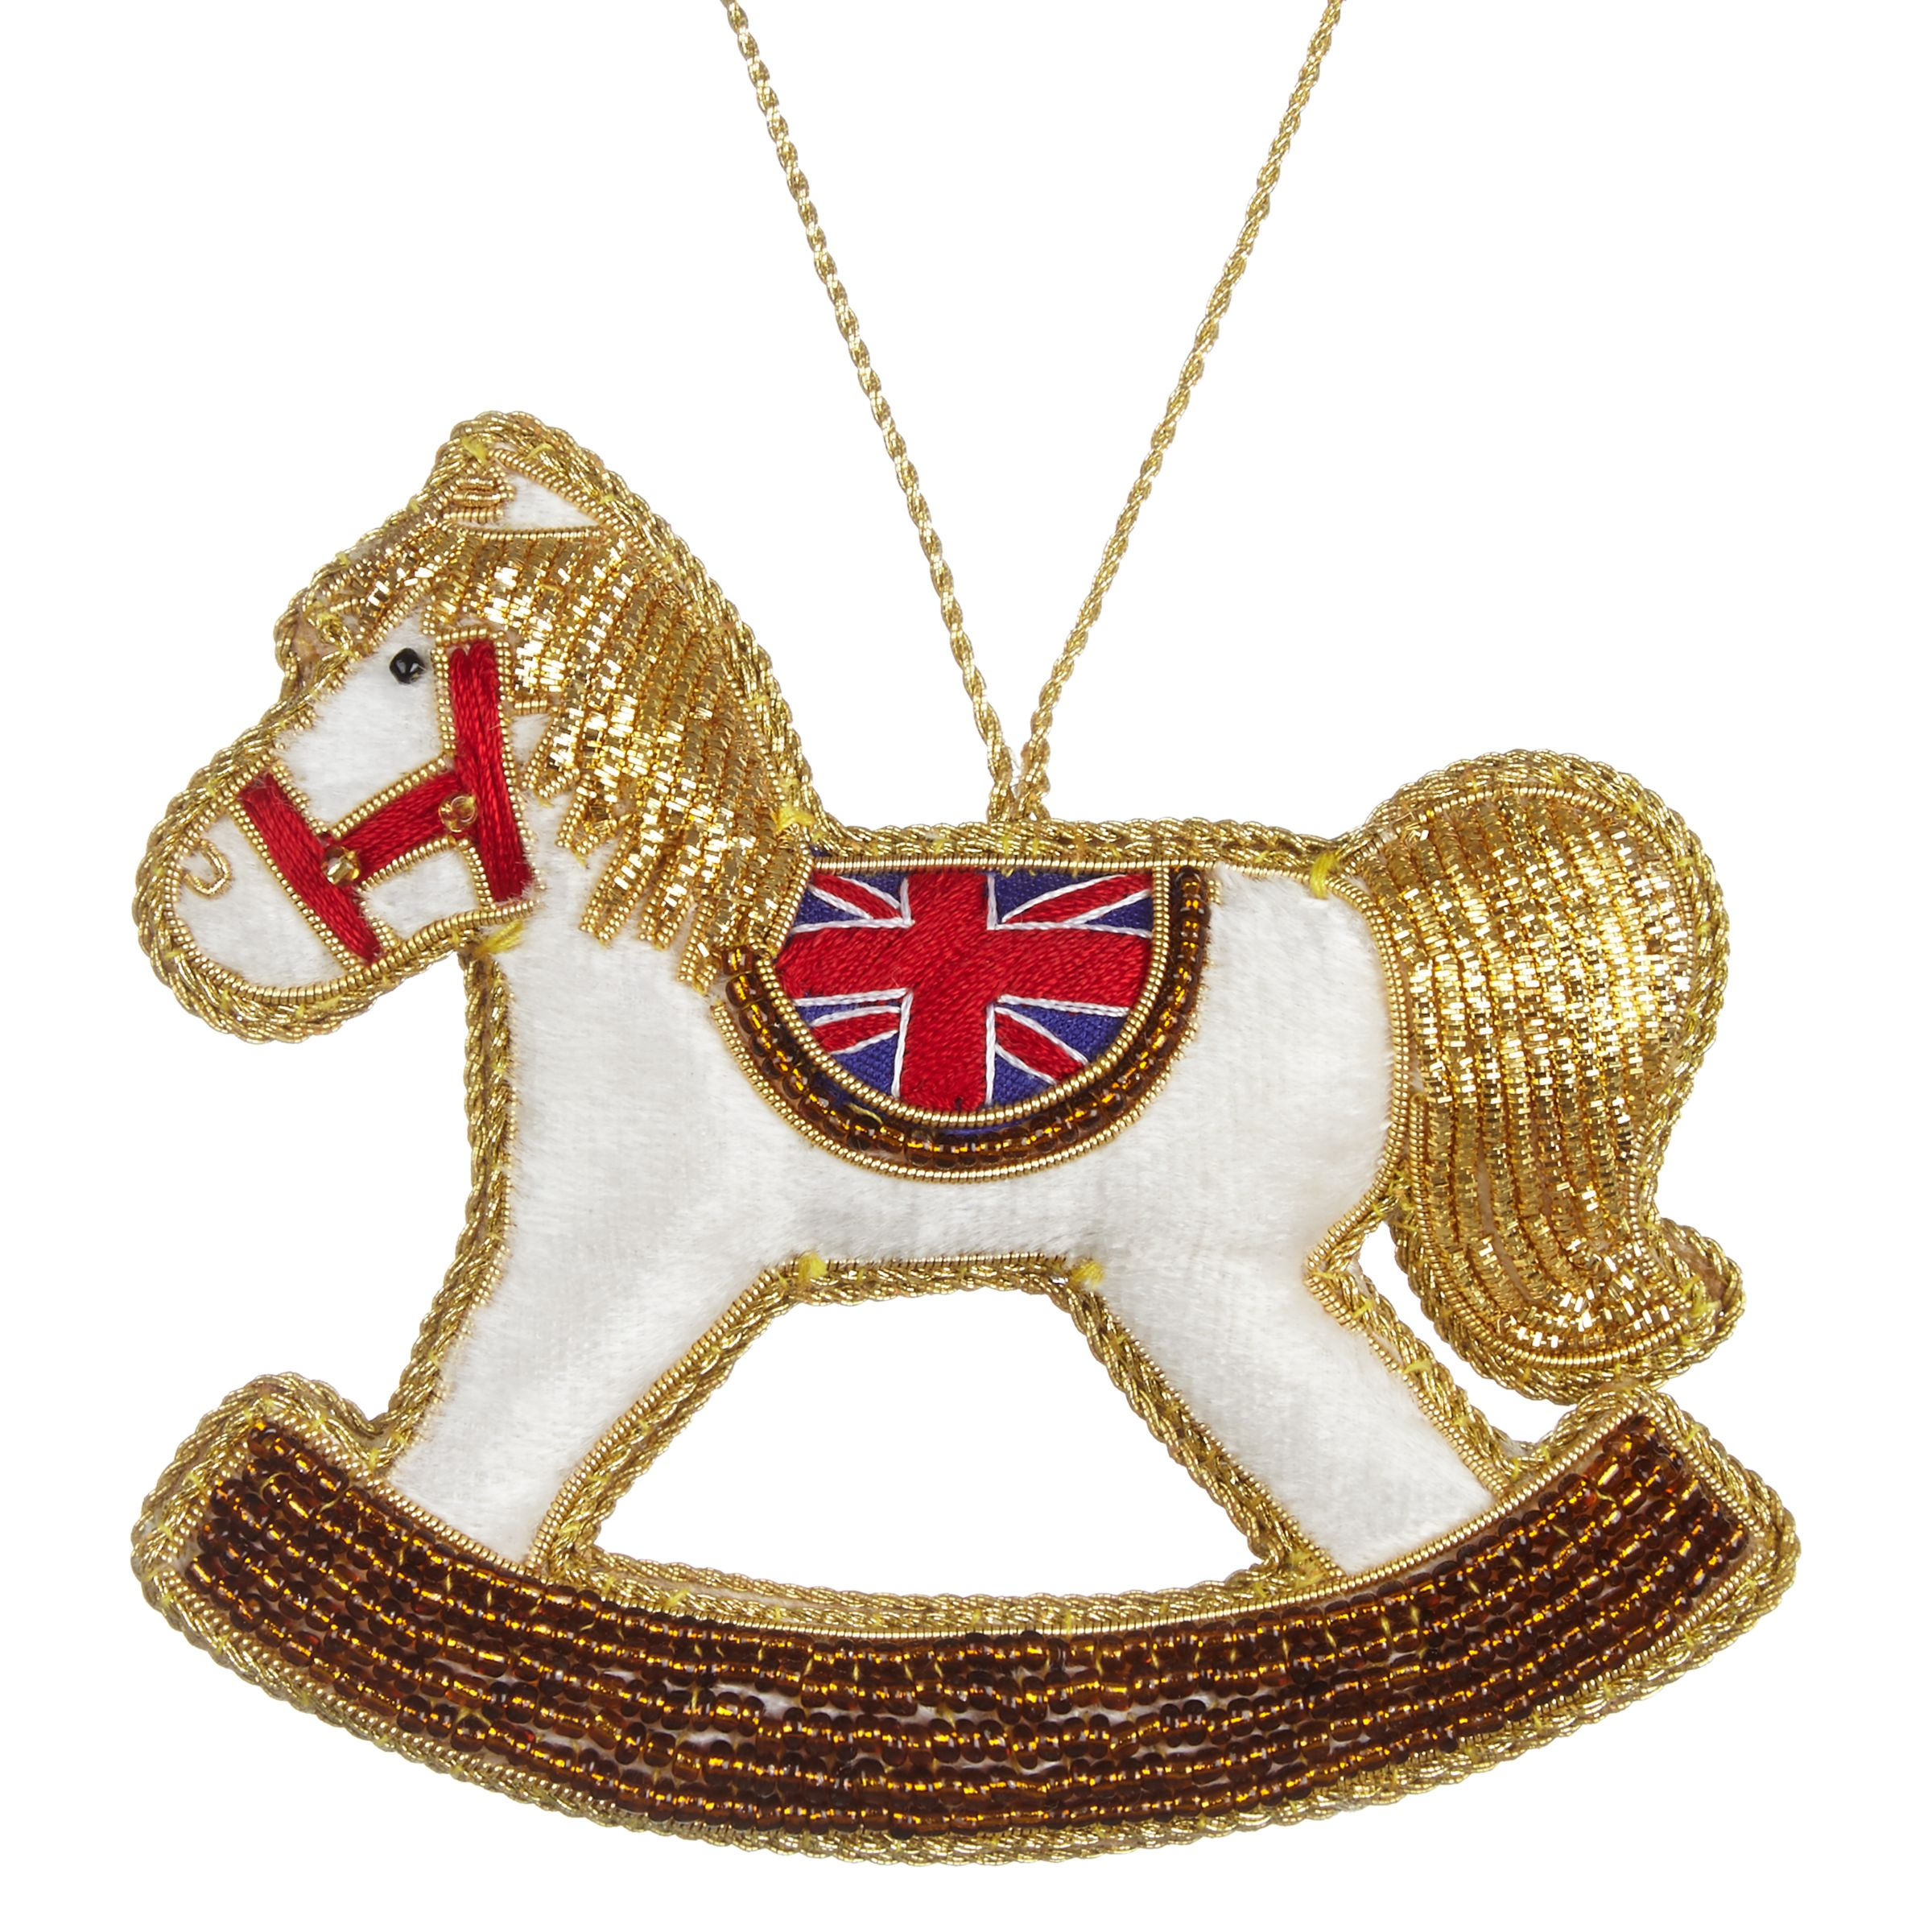 Tinker Tailor Tinker Tailor Tourisim Union Jack Rocking Horse Hanging Decoration